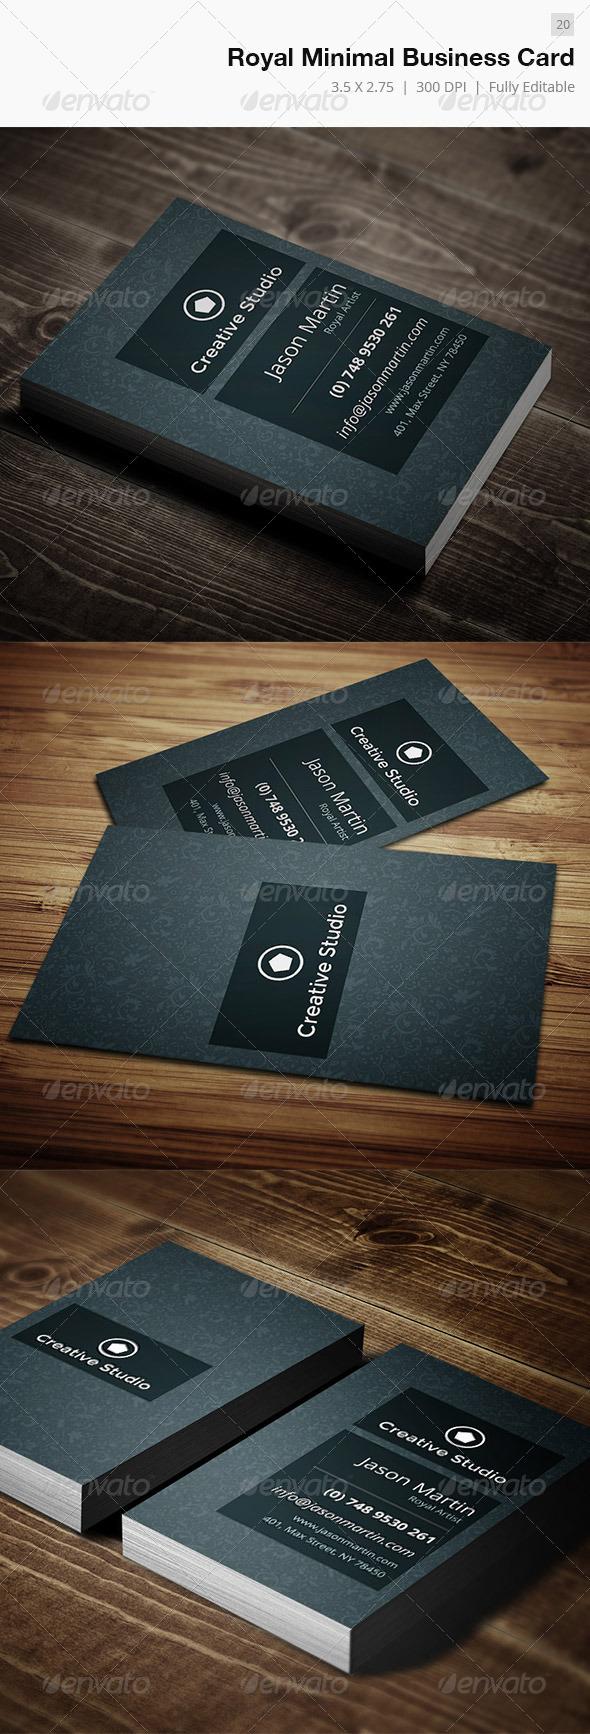 Royal Minimal Business Card - 20 - Creative Business Cards